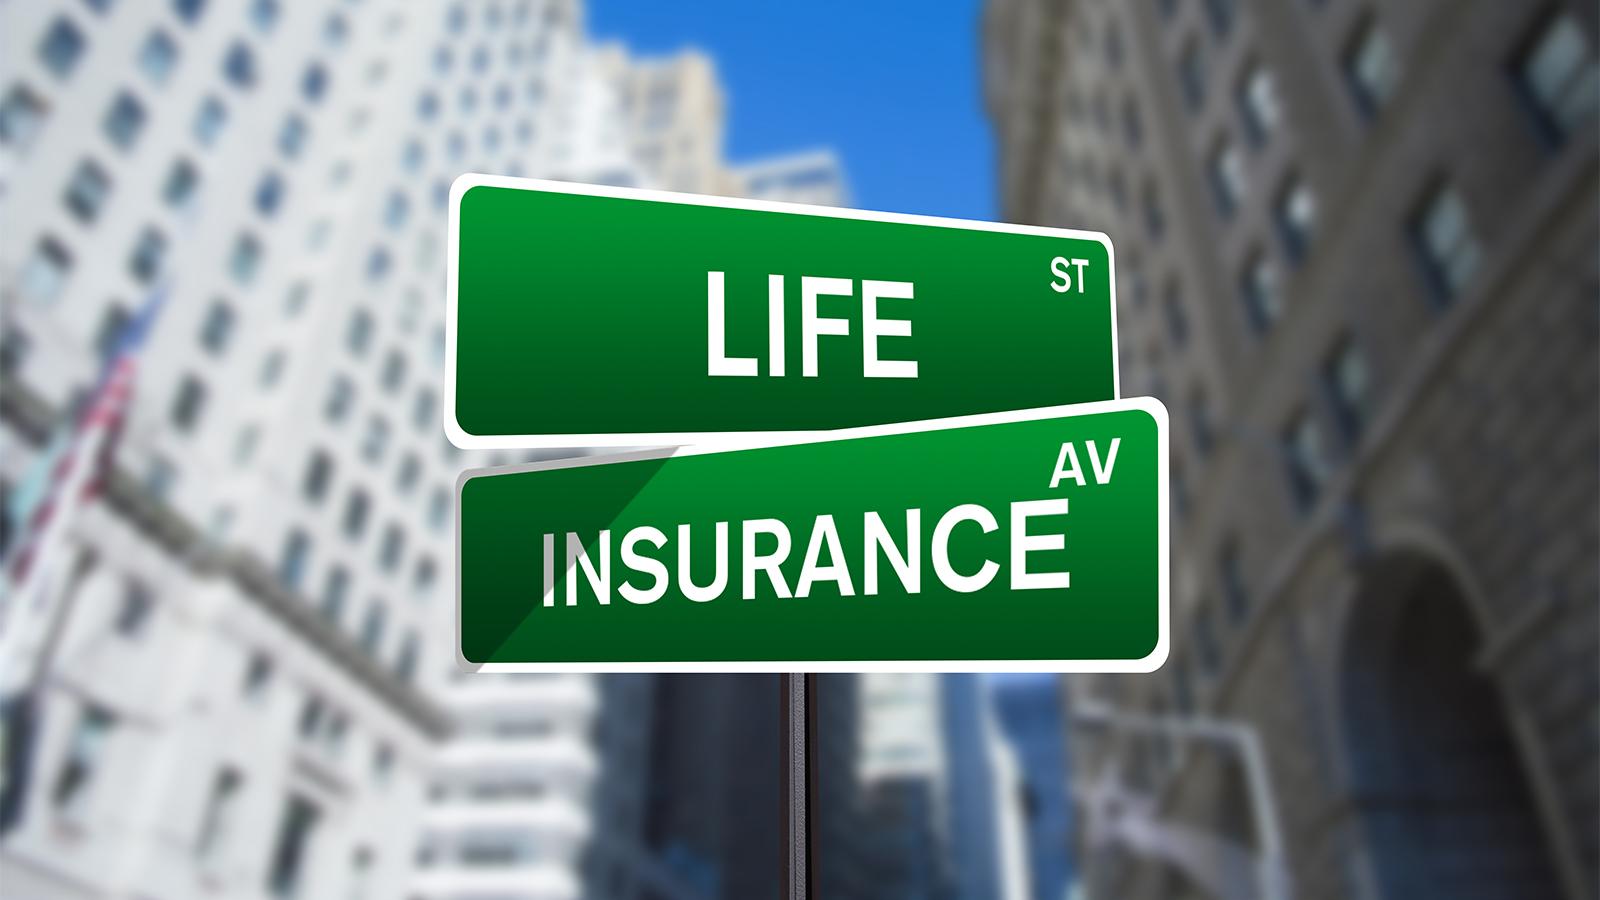 Do I Need Life Insurance? | HowStuffWorks